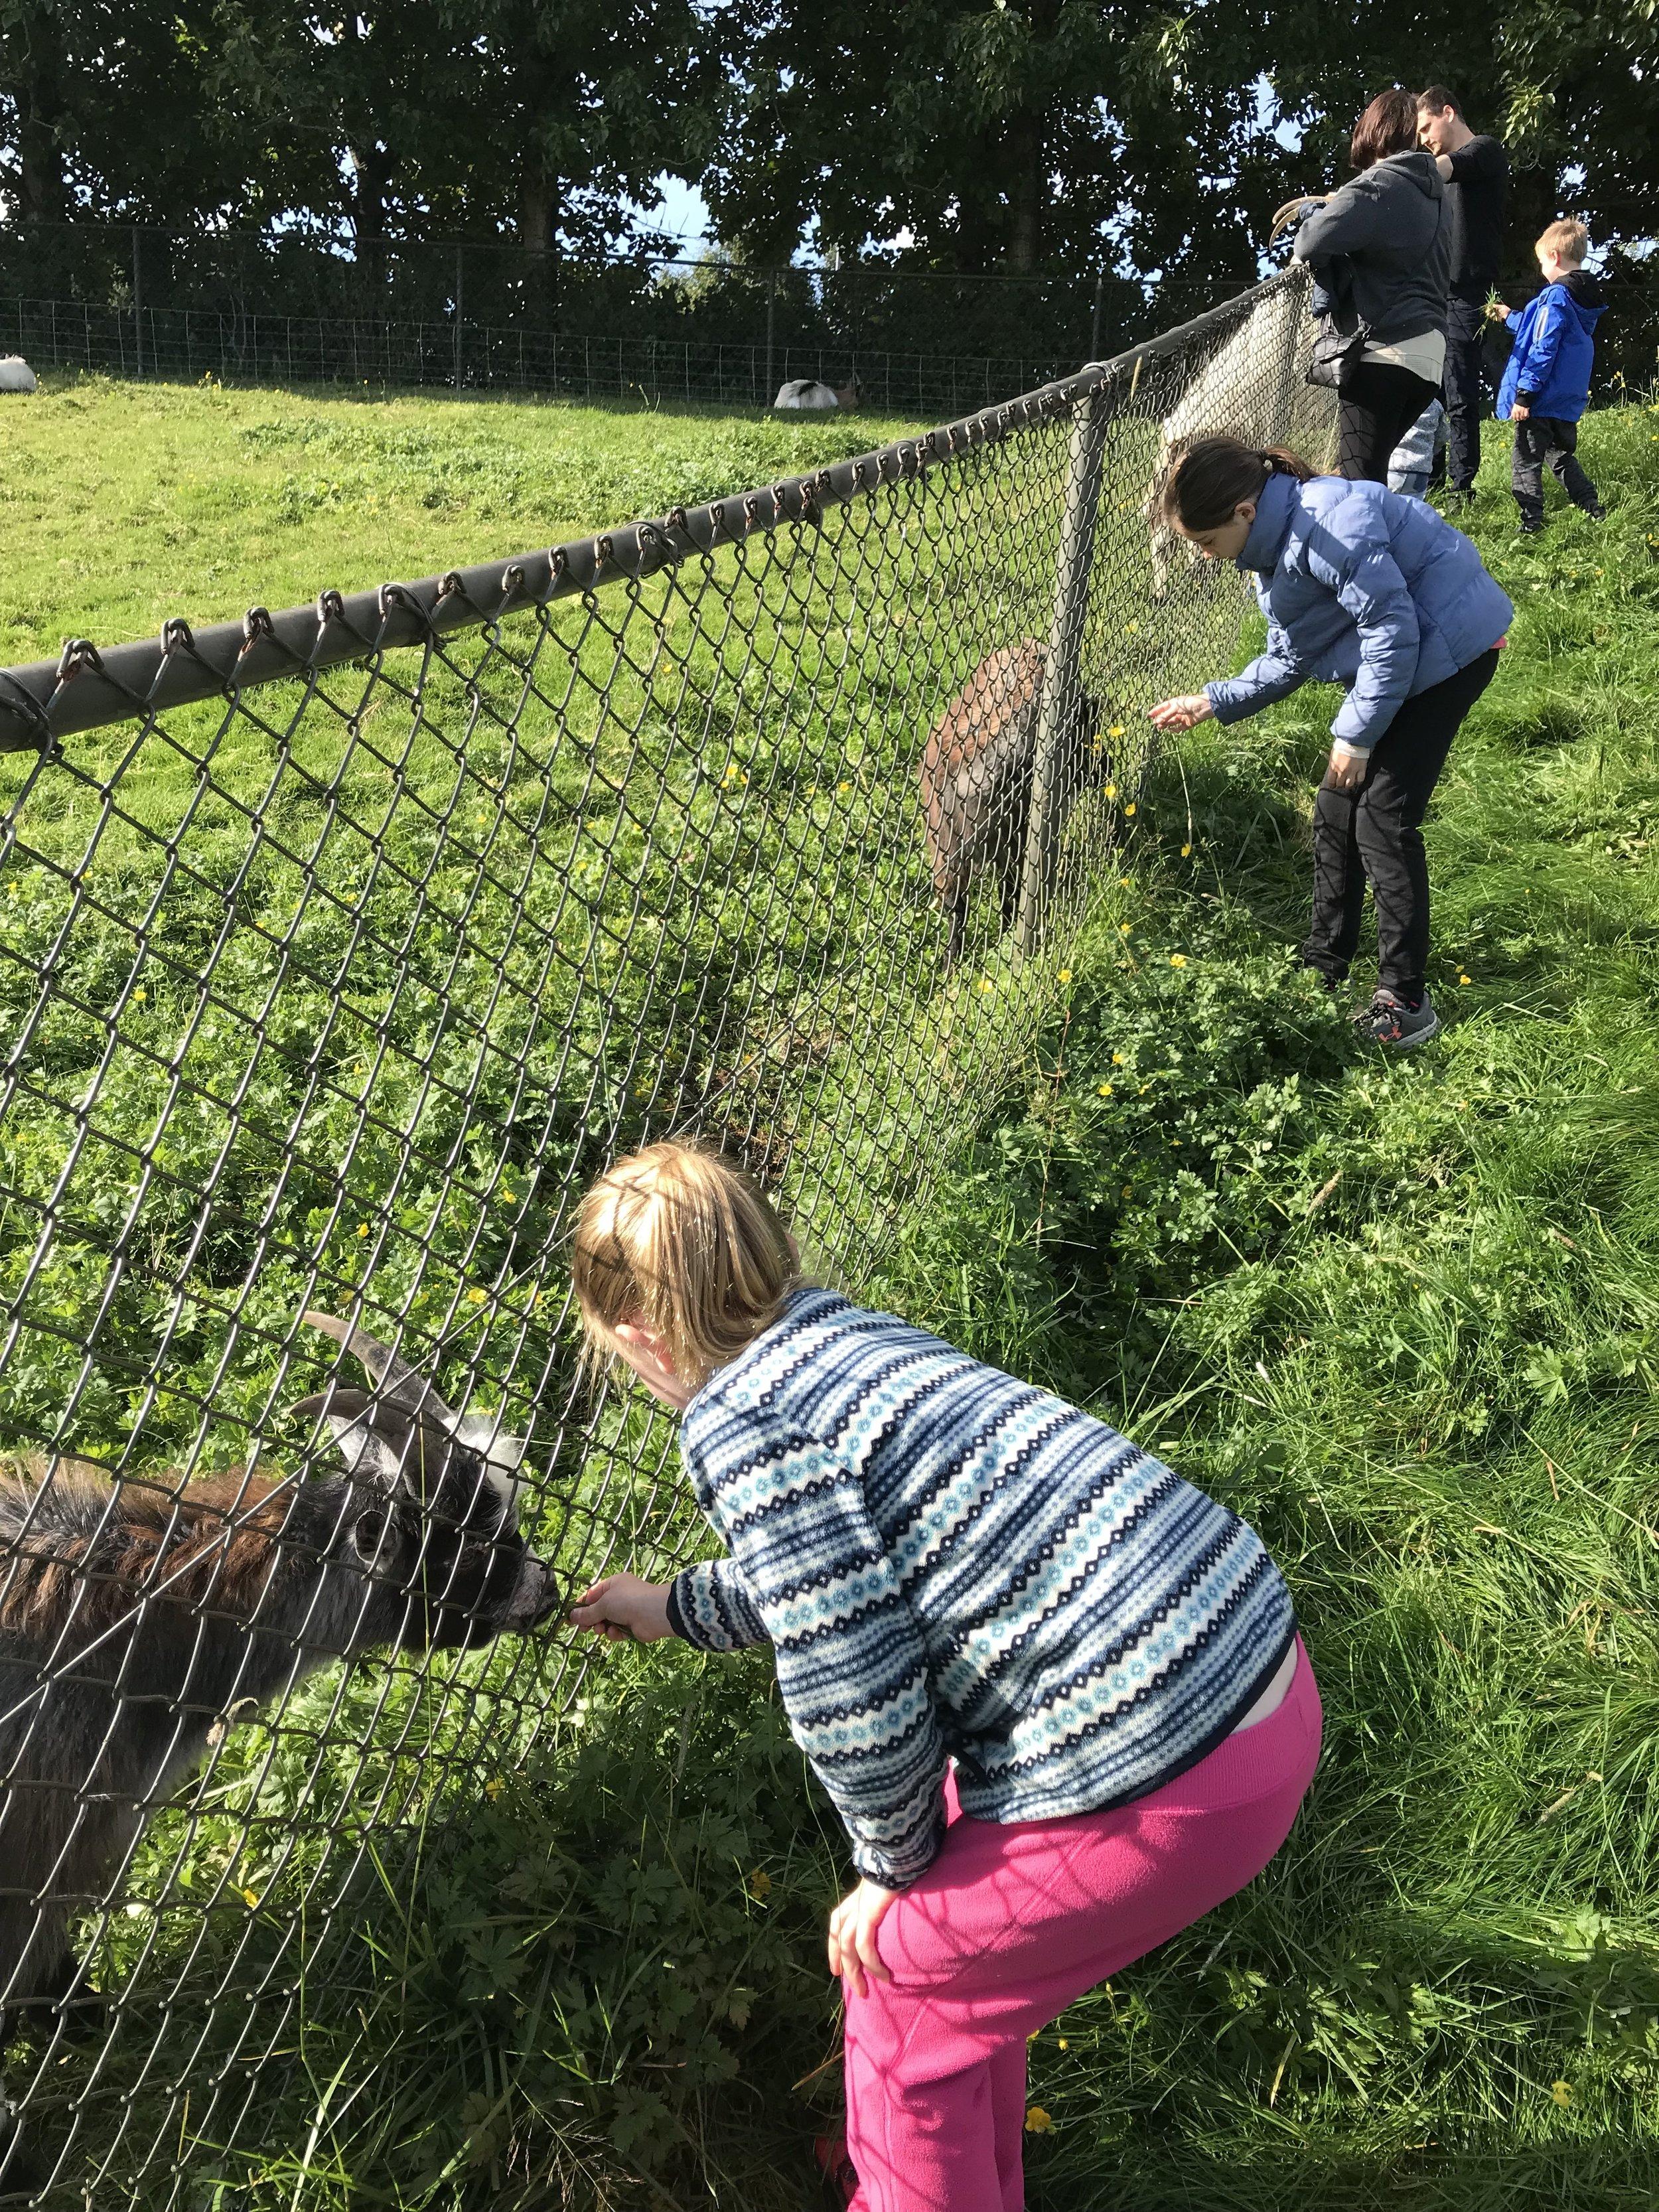 Reykjavik's Family Park & Zoo